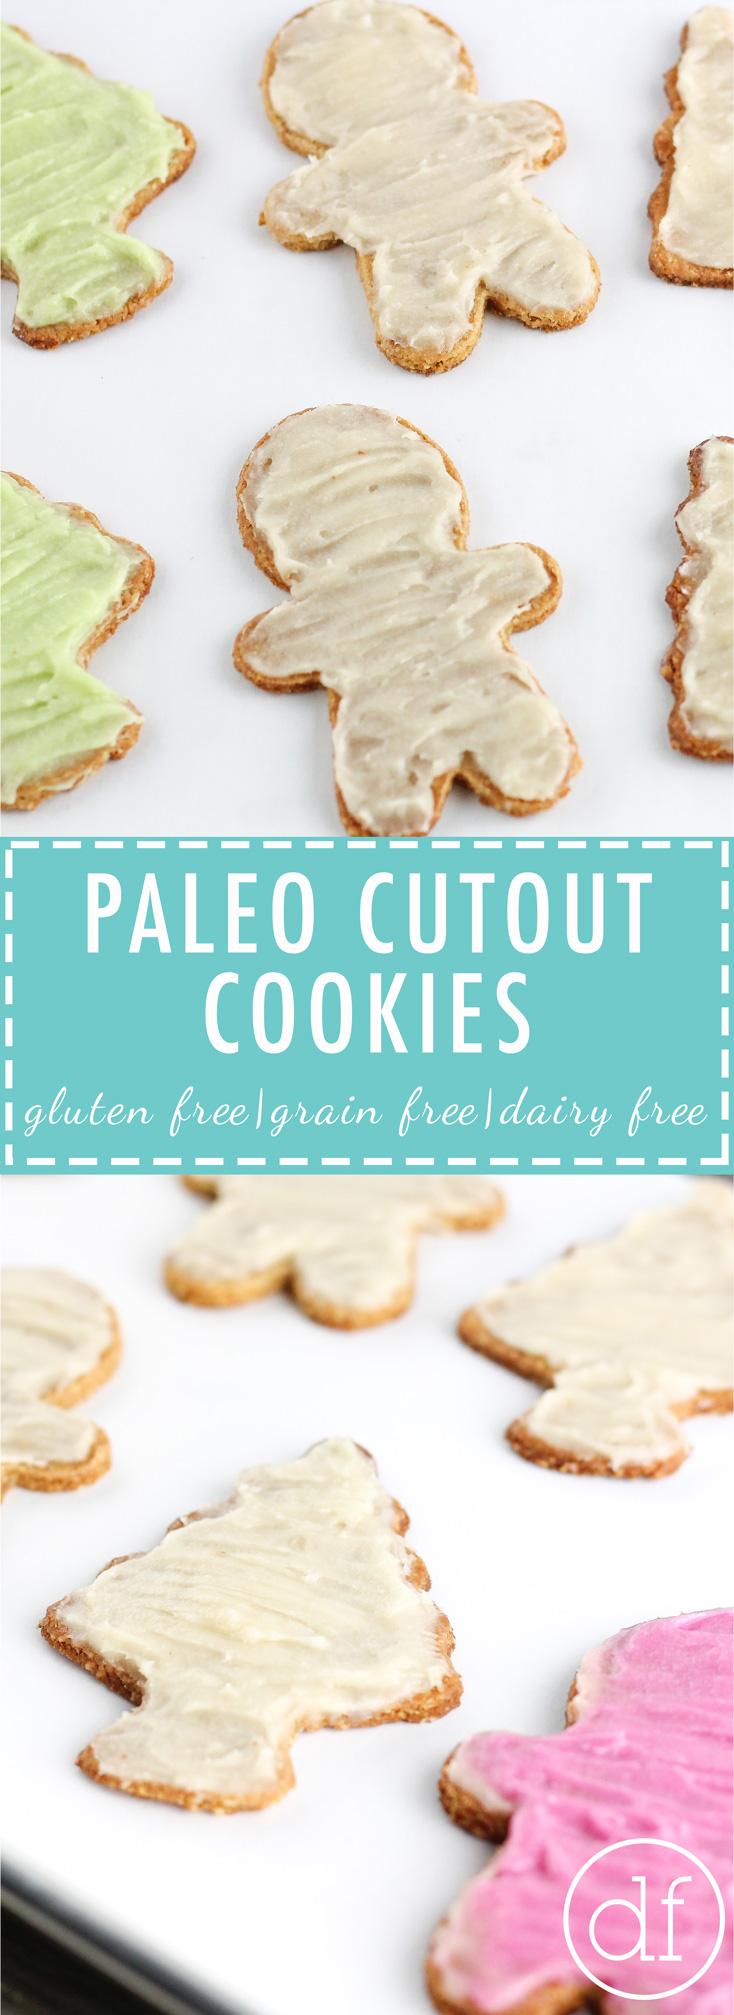 Paleo Cutout Cookies, Paleo Cookies, Paleo Christmas Cookies, Grain Free Cookies, Gluten Free Cookies, Dairy Free Cookies, Sugar Cookies